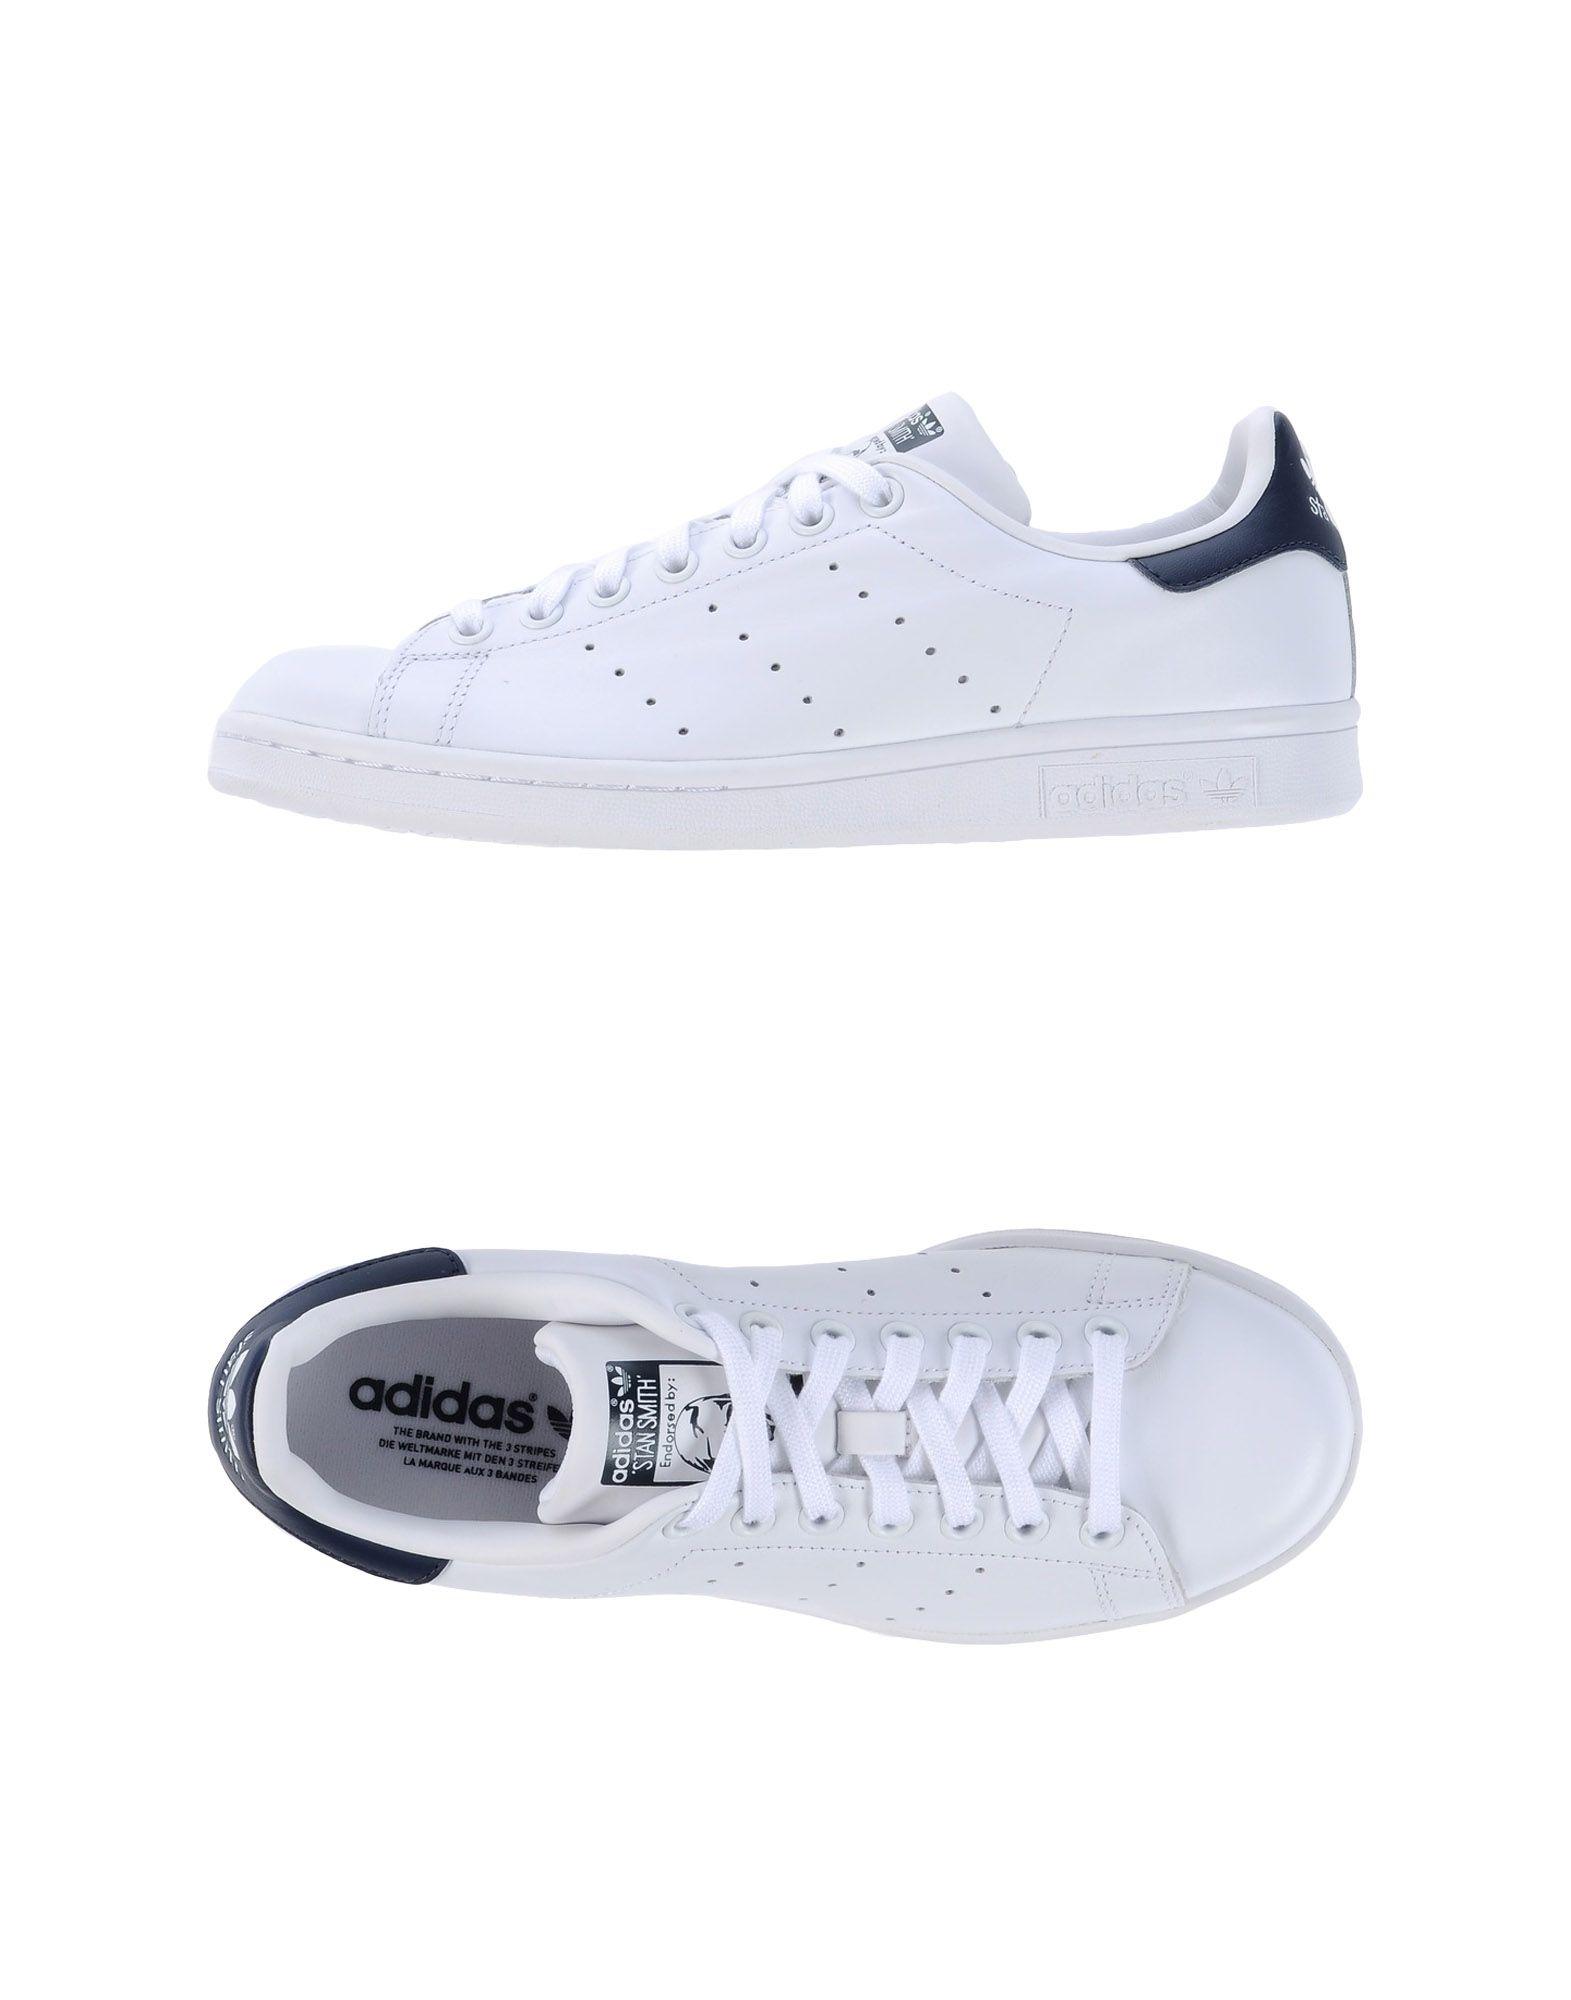 adidas originaux stan smith - tennis - hommes en adidas originaux des baskets en hommes ligne le royaume - uni - 44799305sb 81816c